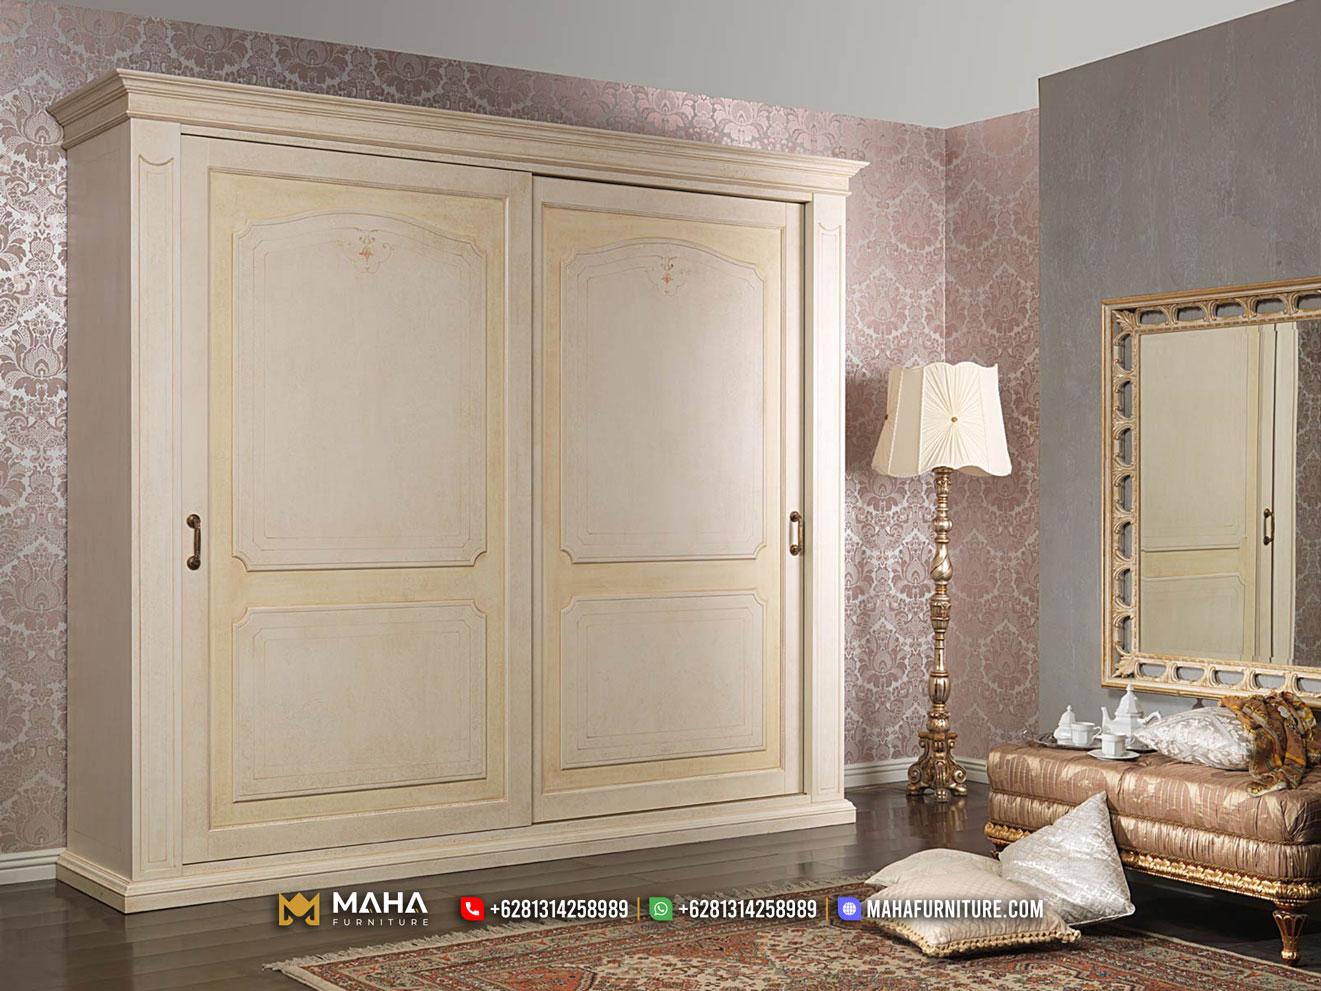 Lemari Pakaian Minimalis Model Vintage Natural Furniture Jepara MF316